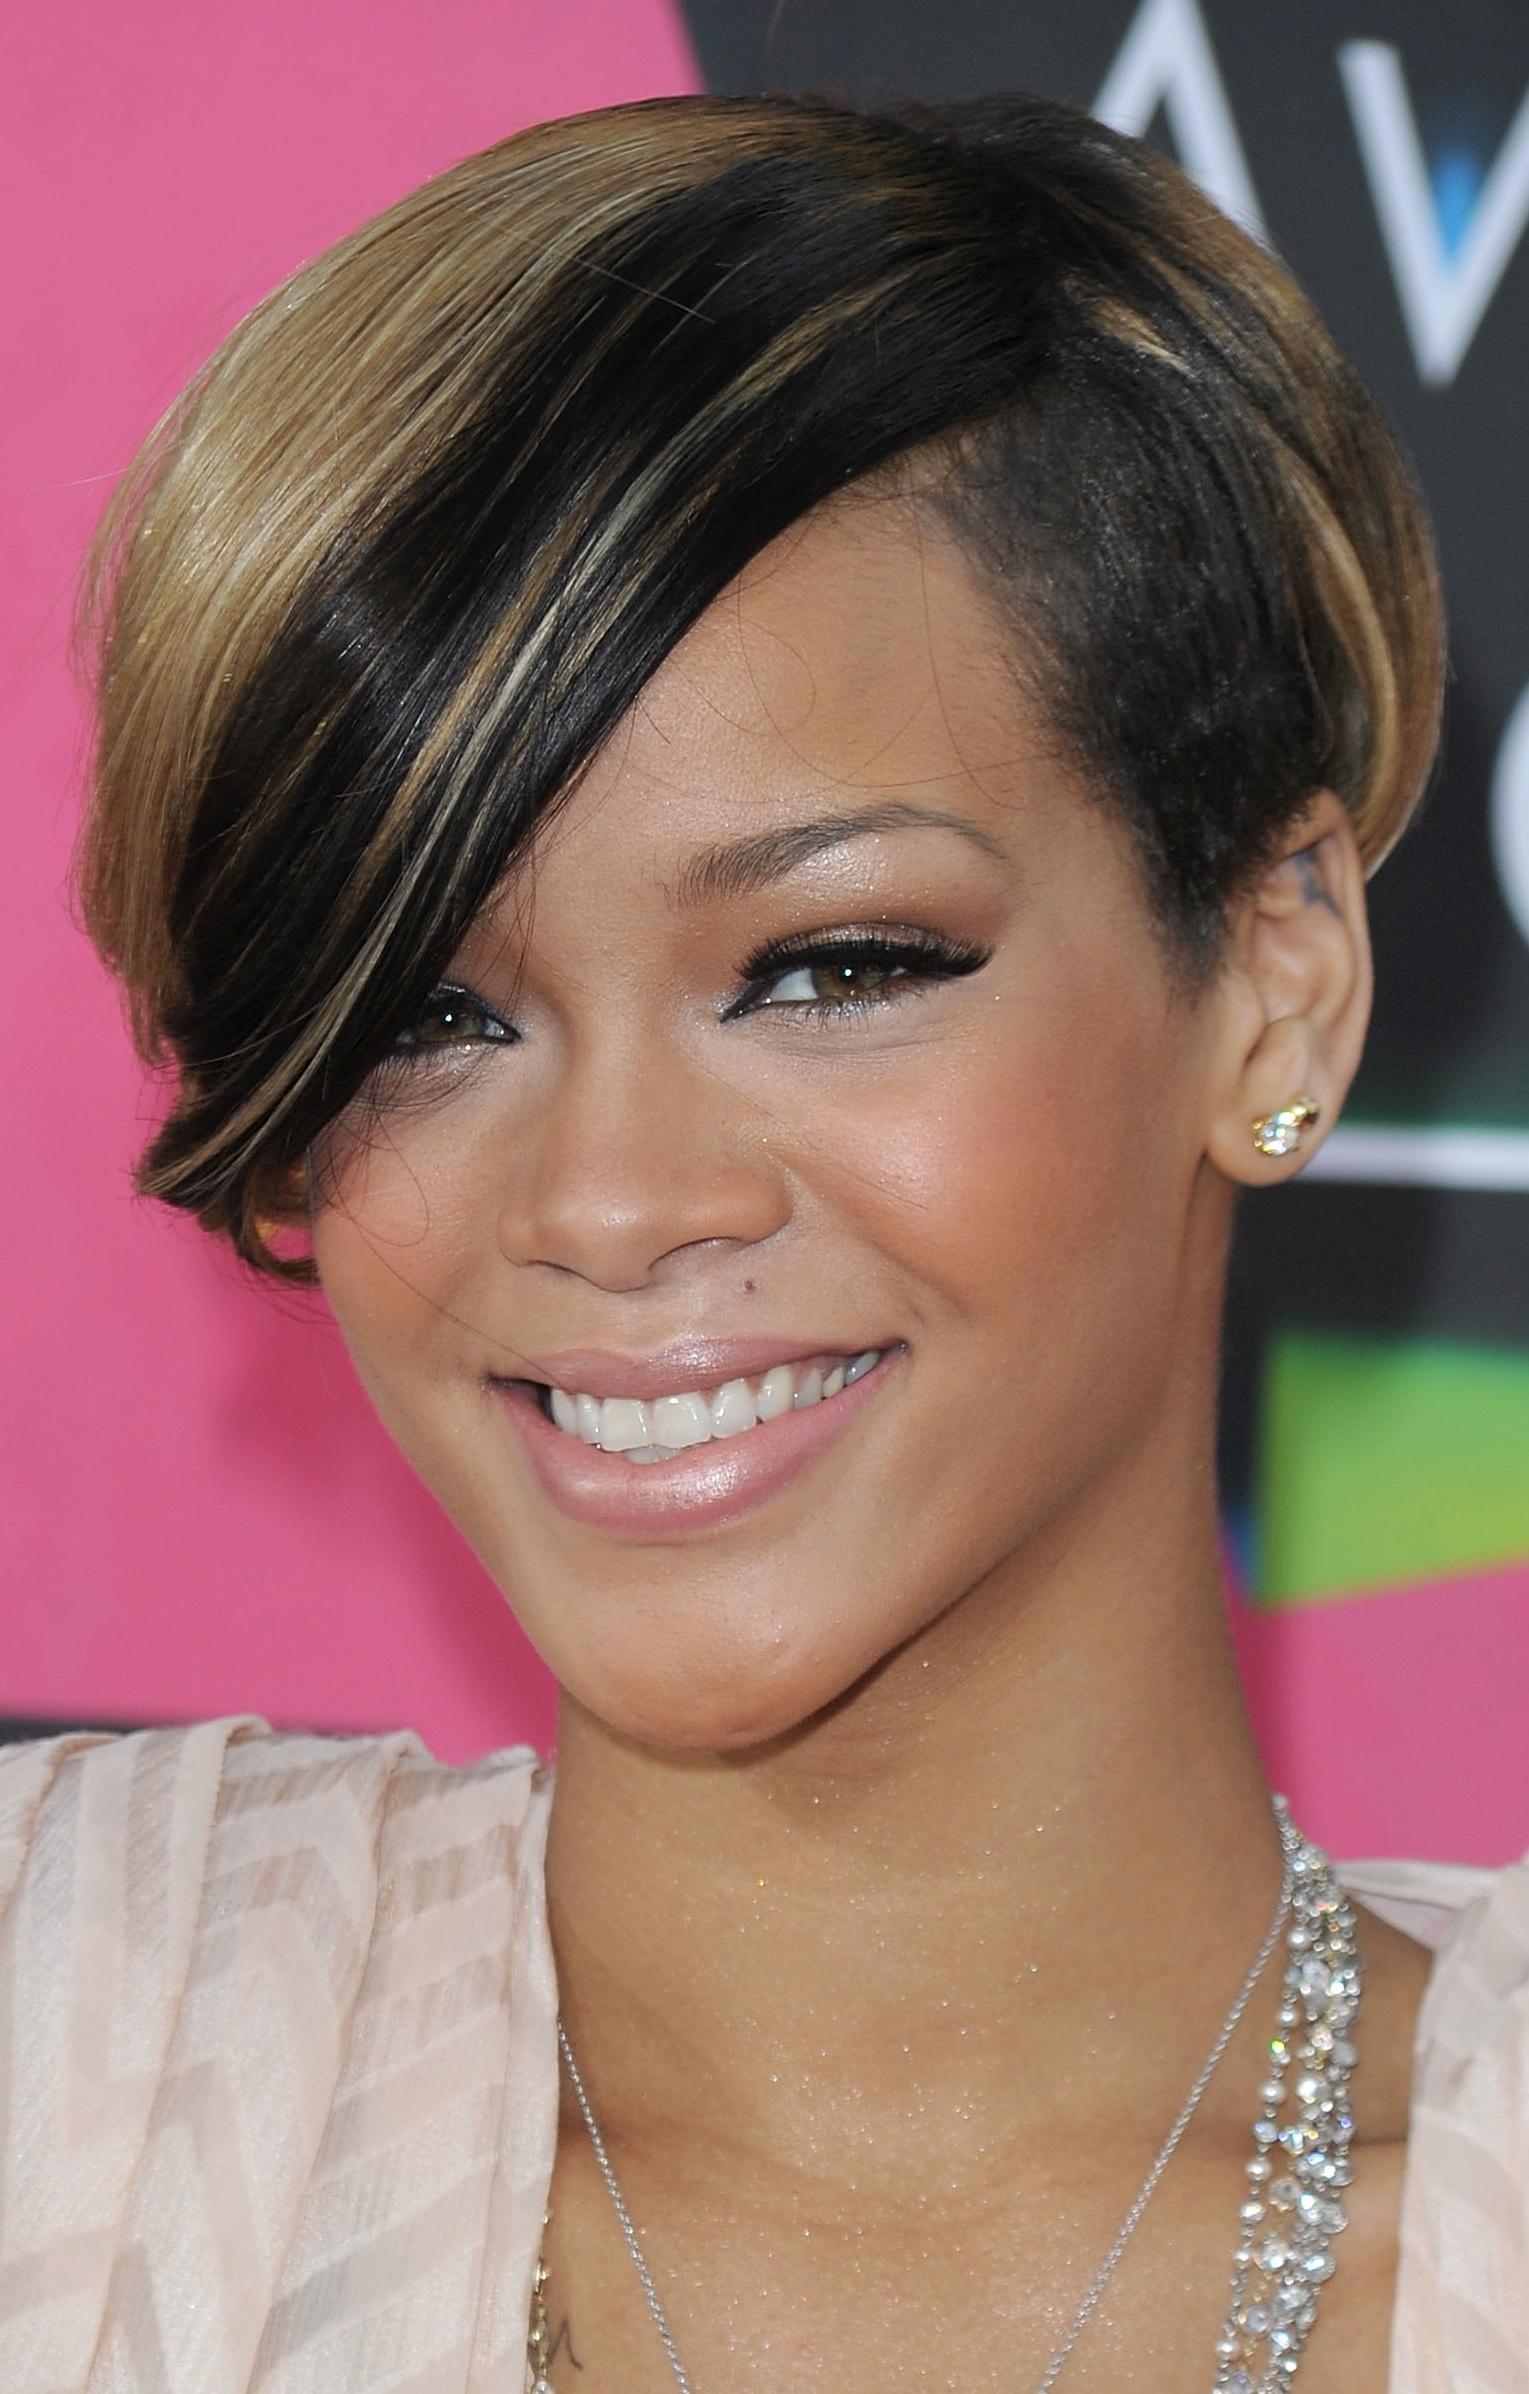 Surprising African Short Hairstyles 2014 Short Hairstyles For Women And Man Short Hairstyles Gunalazisus